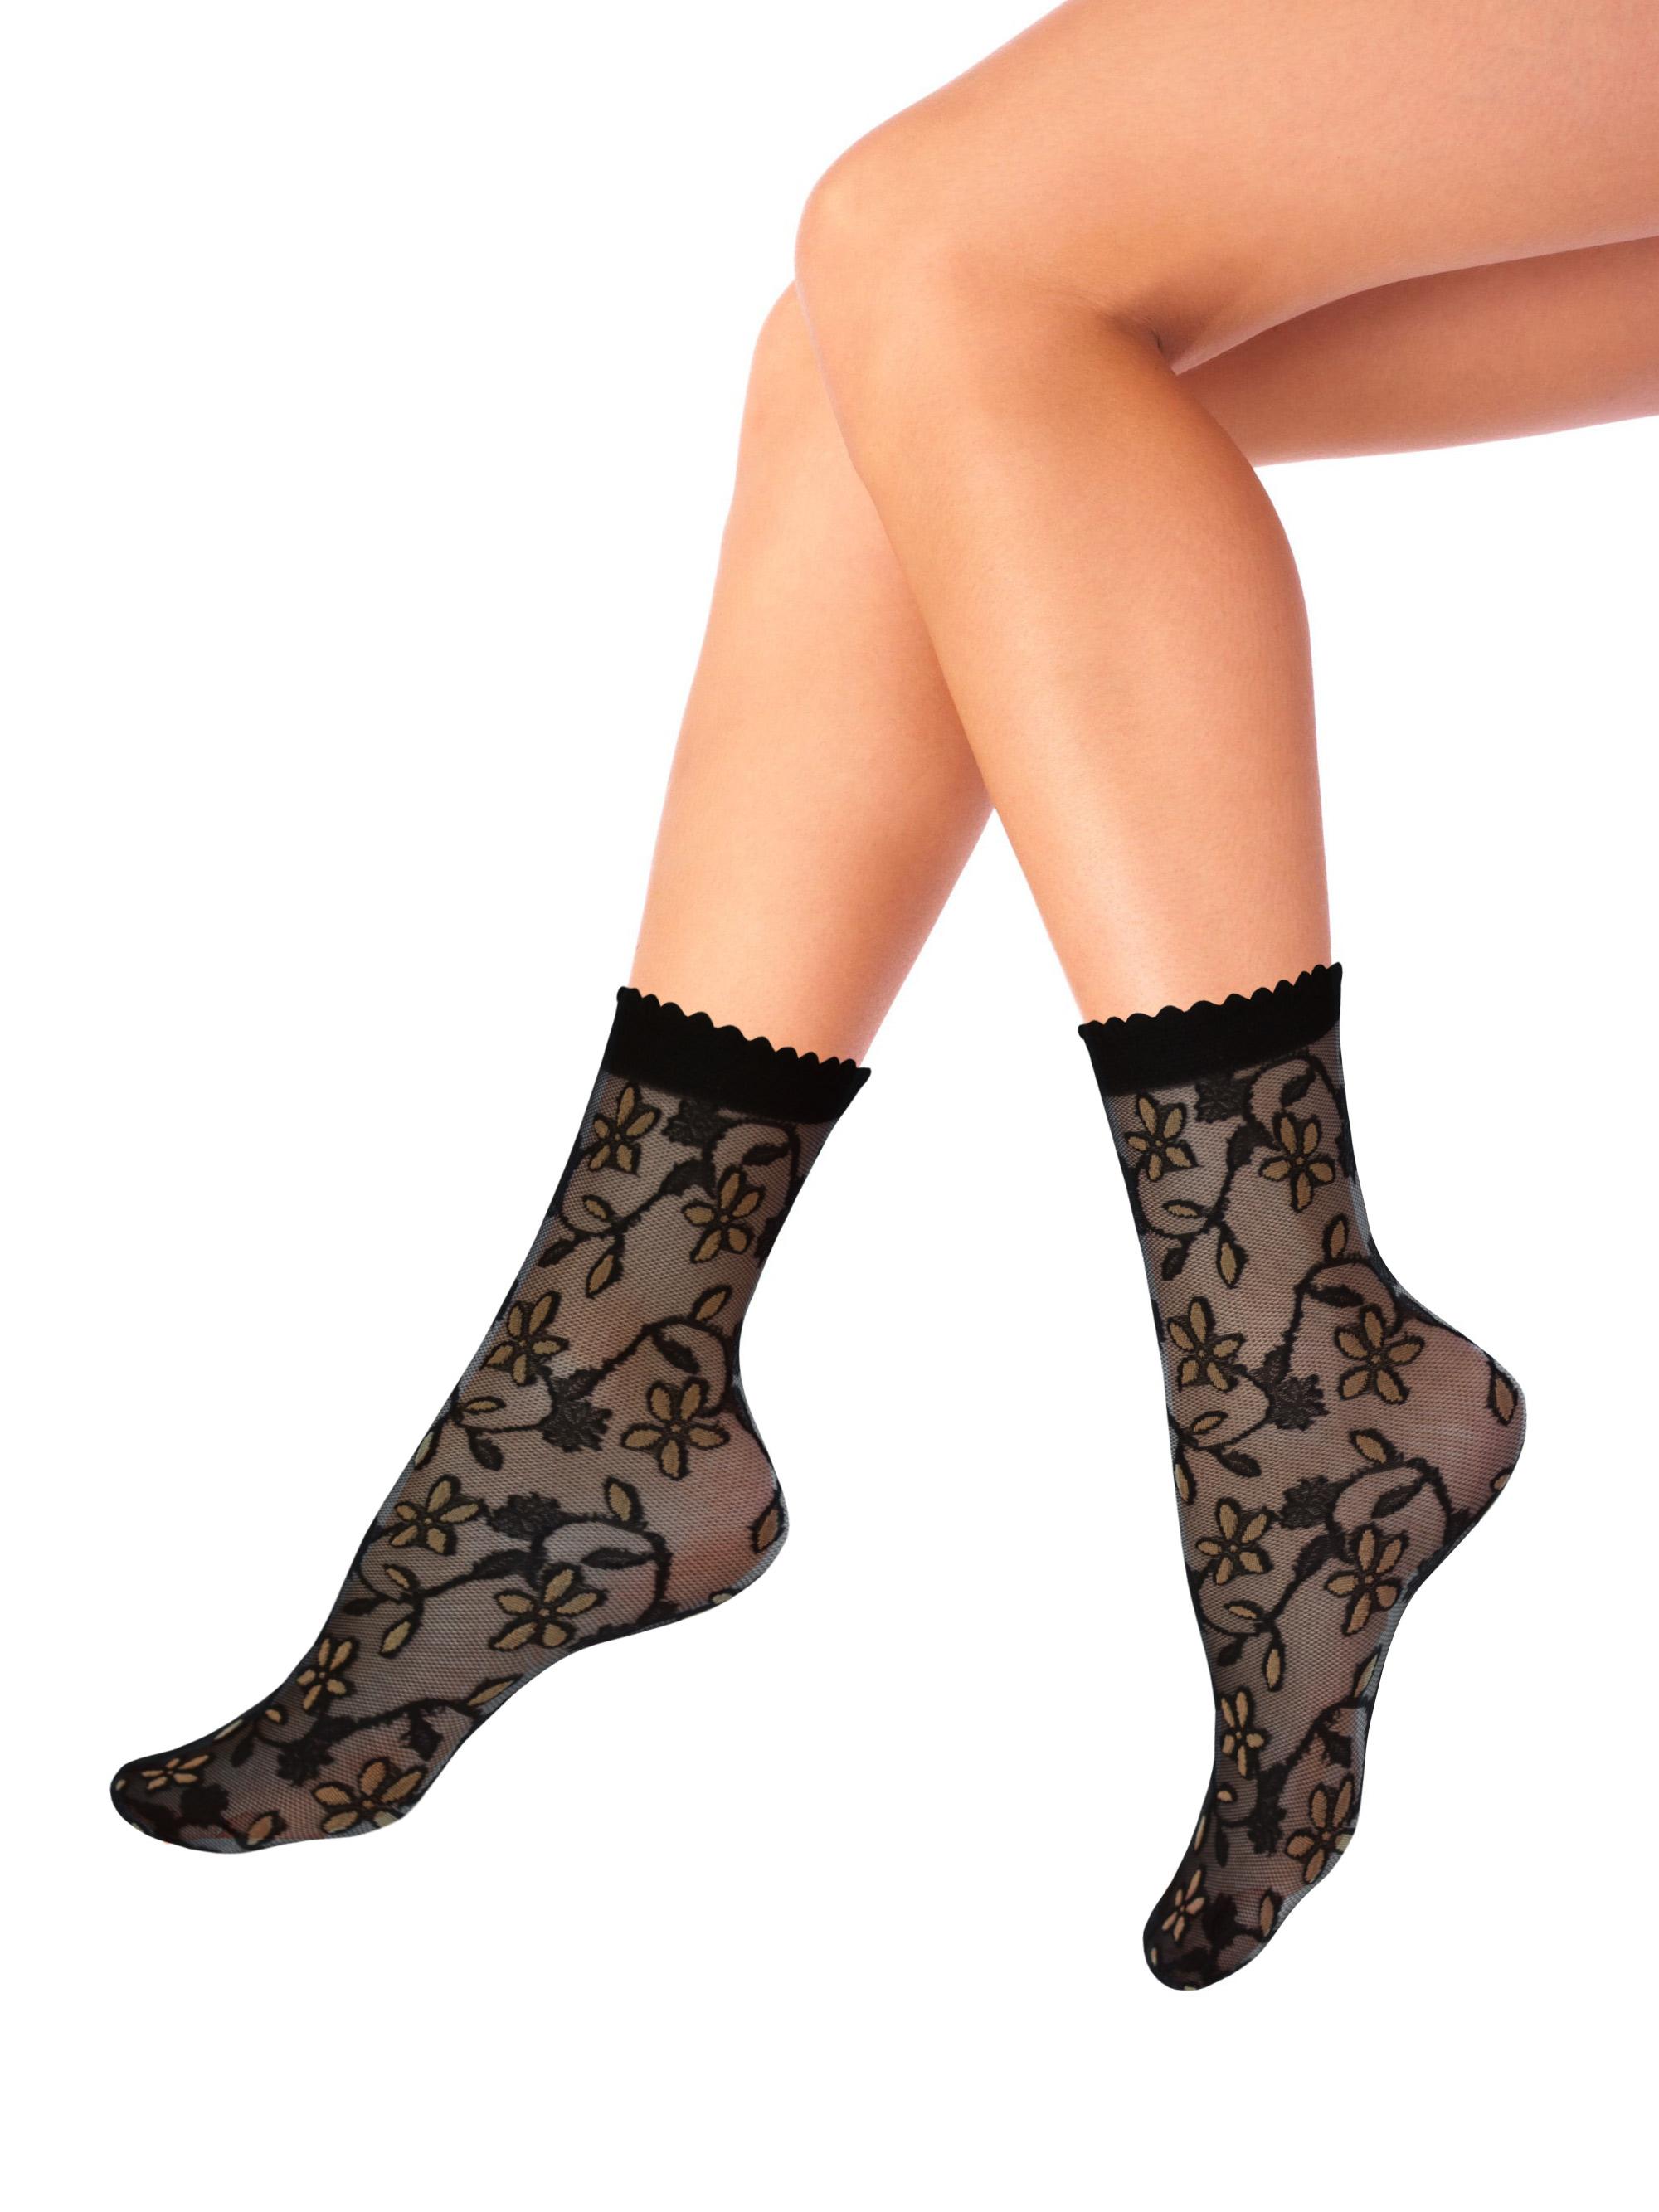 Капроновые носки женские Mademoiselle Campanula (c.) бежевые UNICA